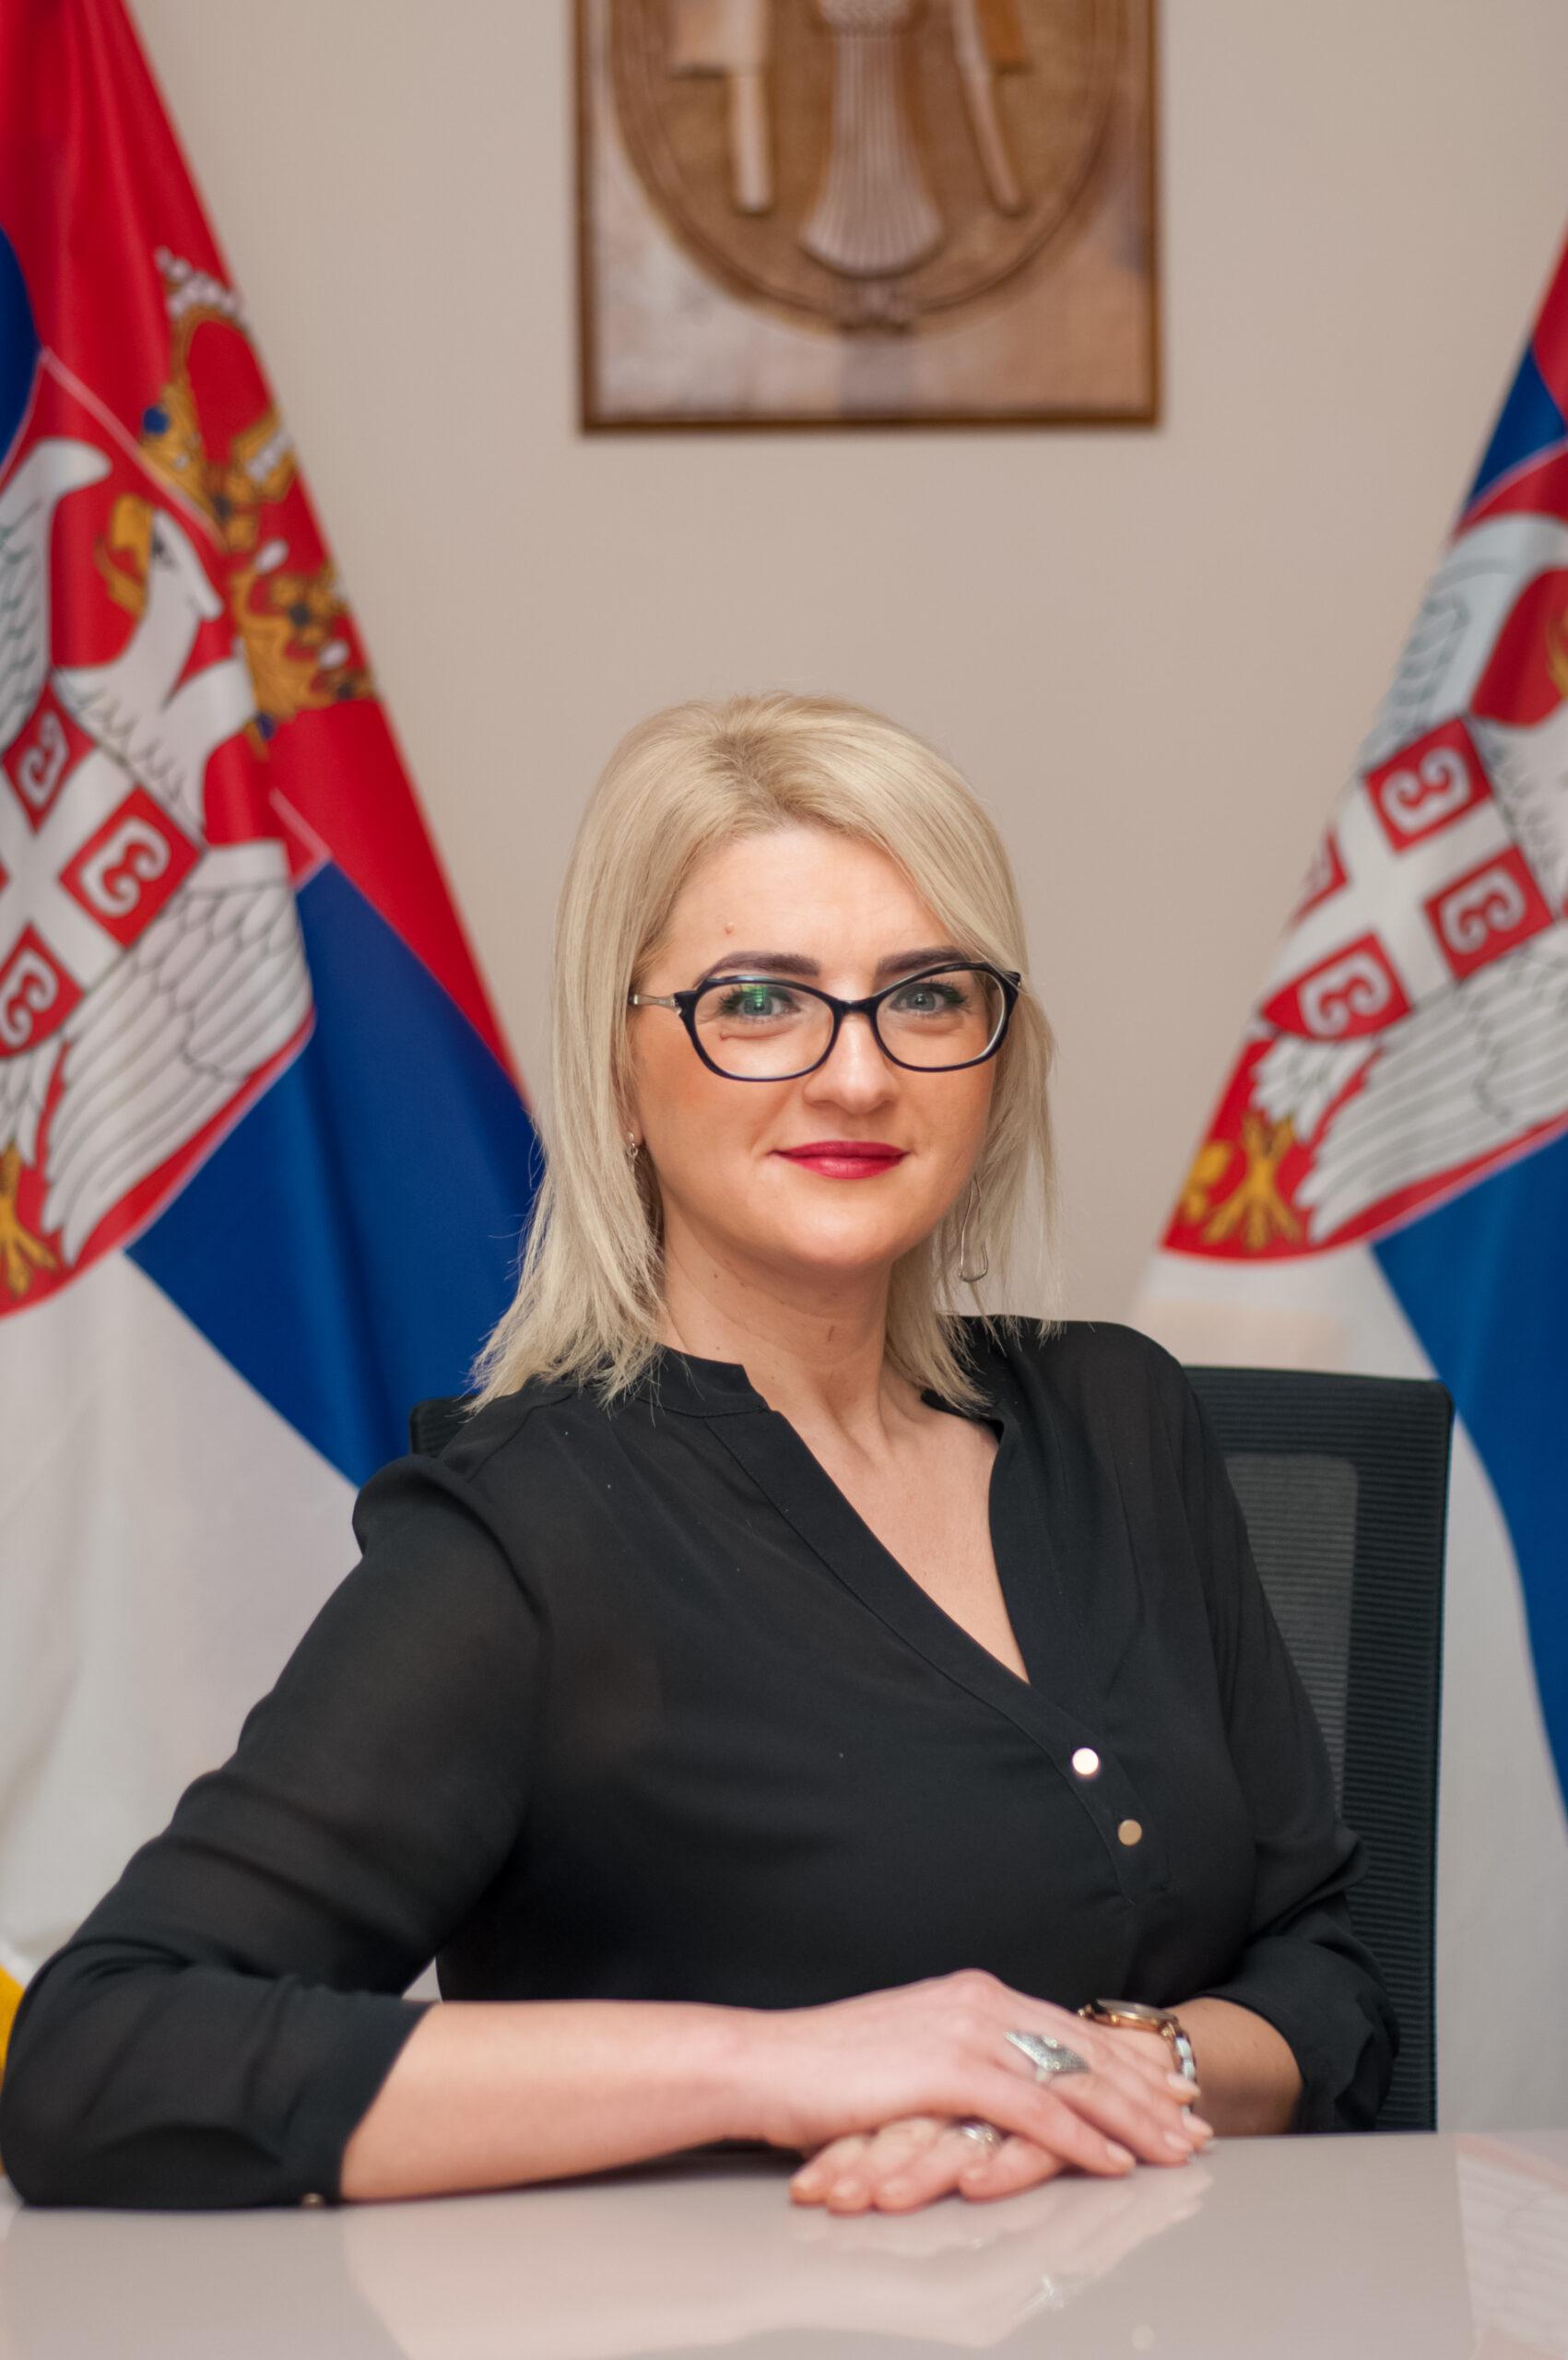 Jovana Lakić